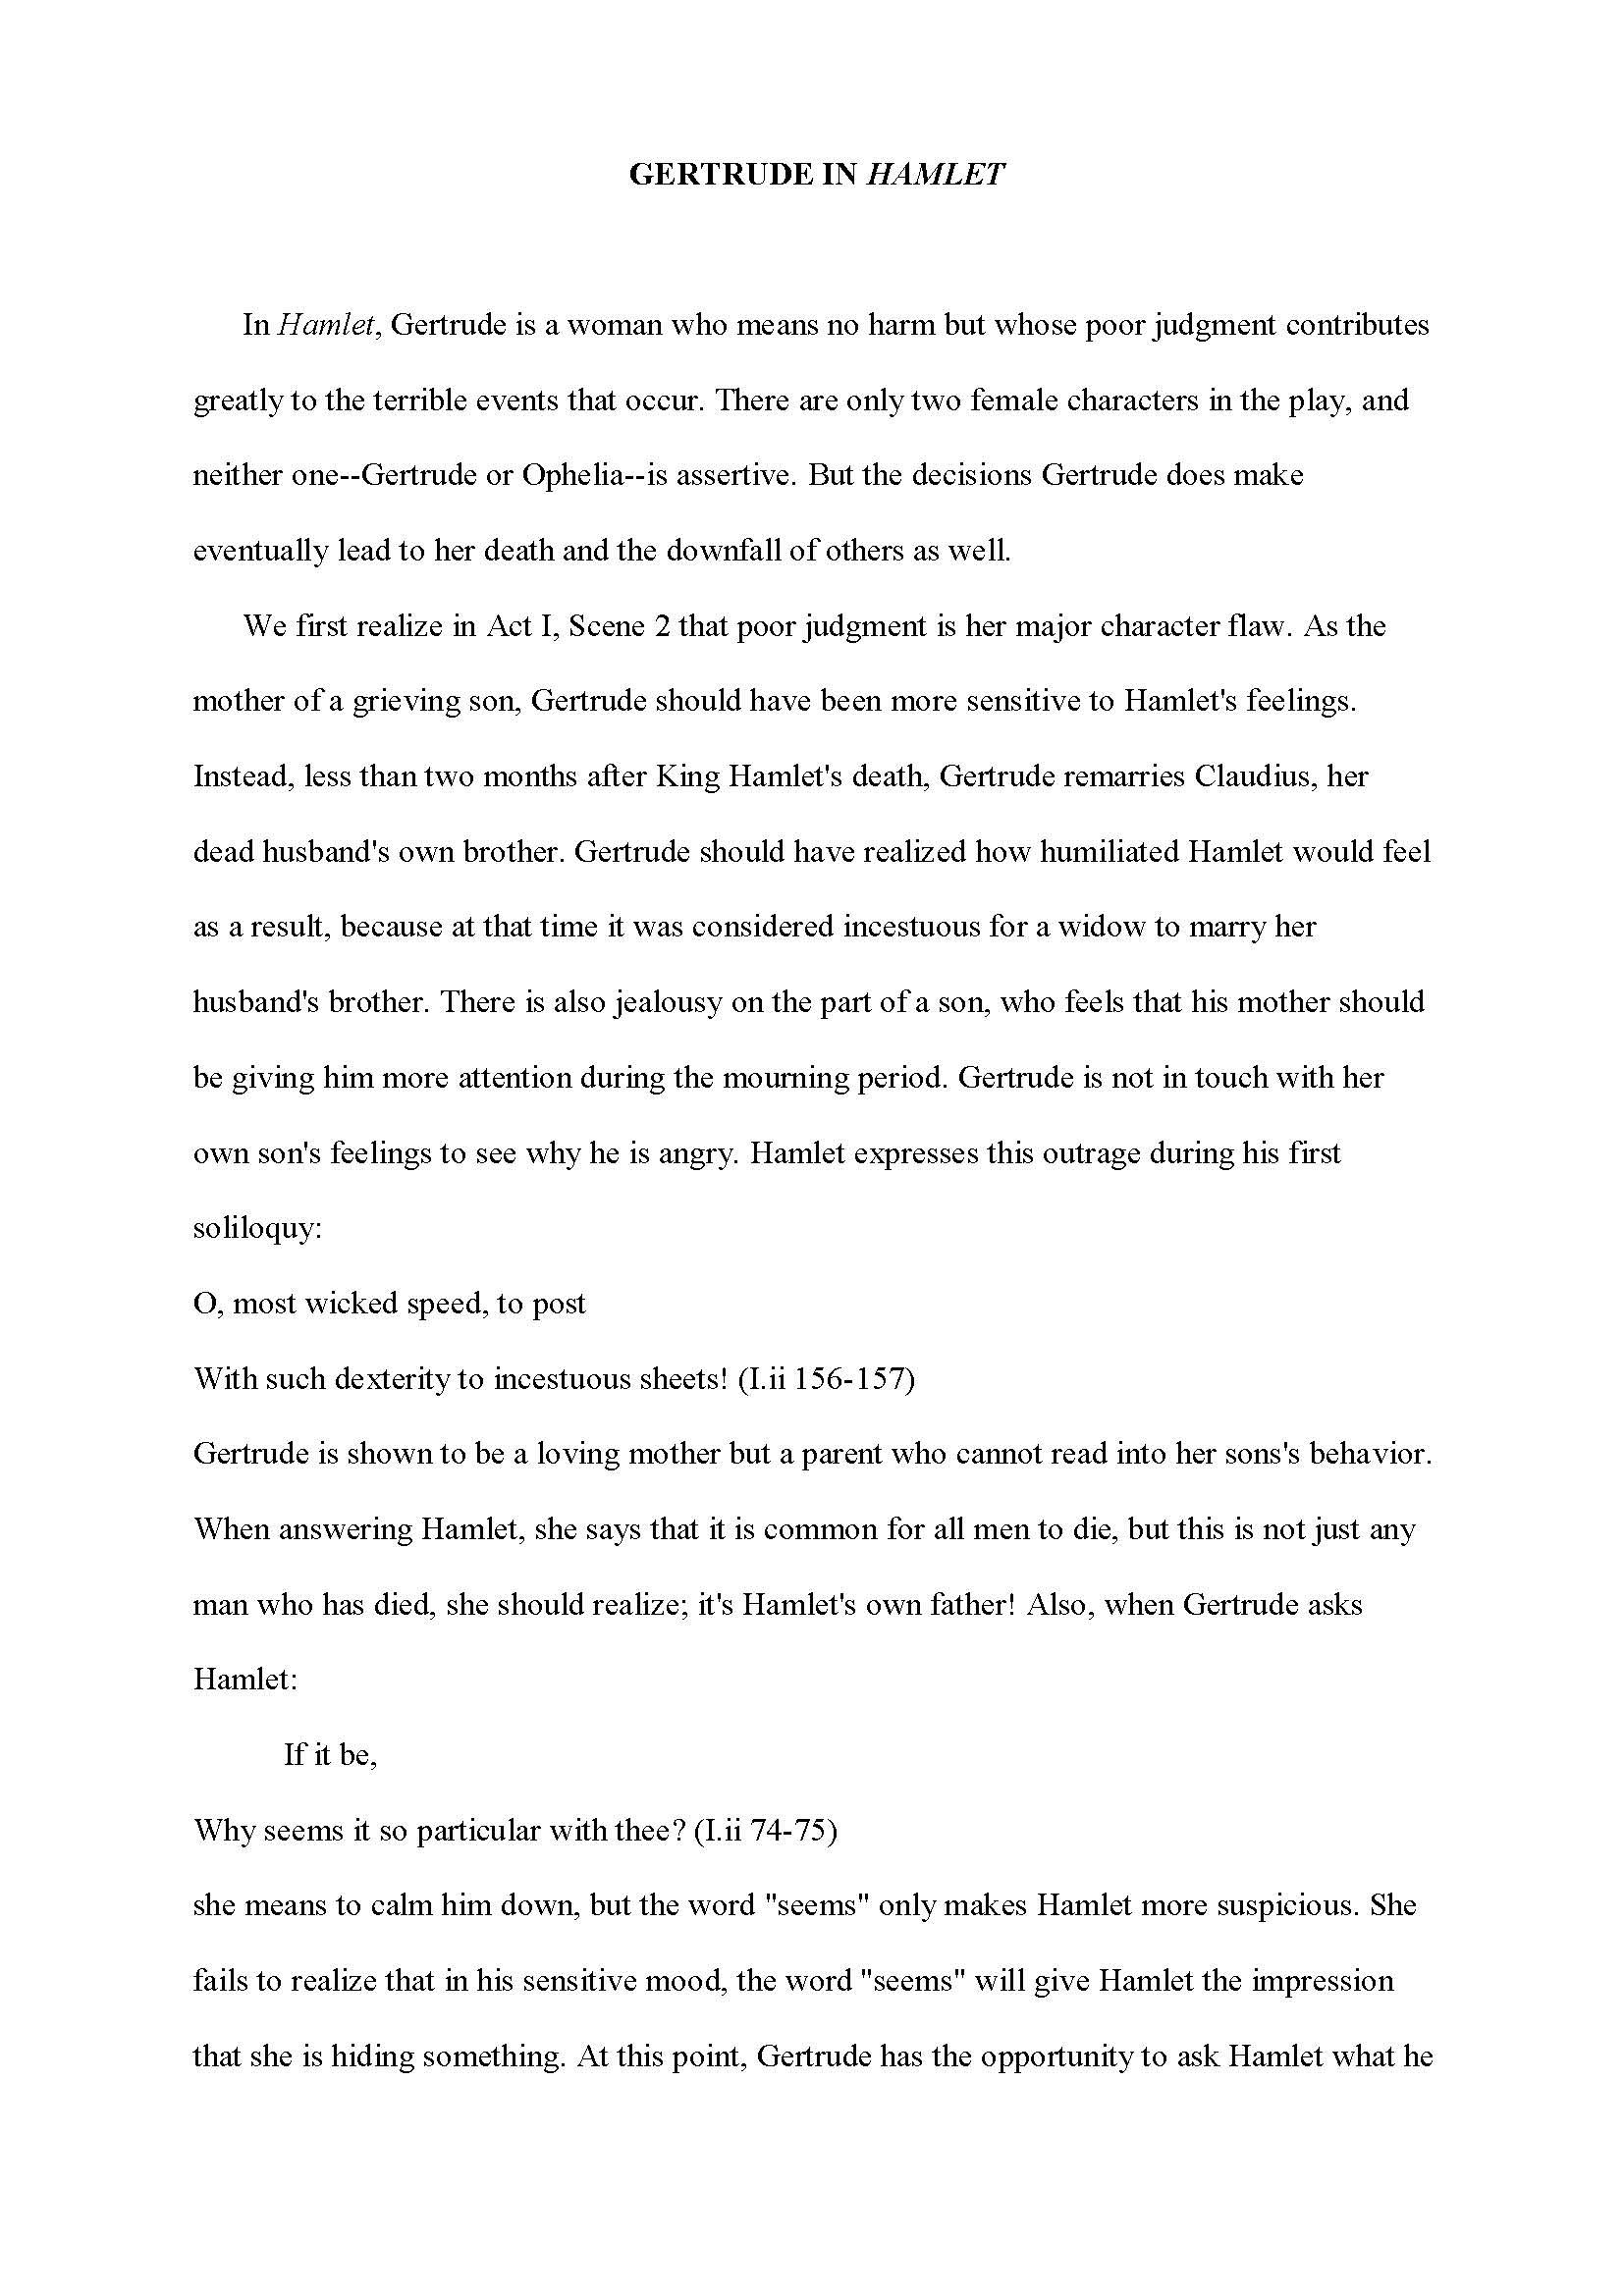 001 Analysis Essay Sample Summarys For Essays Best Summary Examples Full